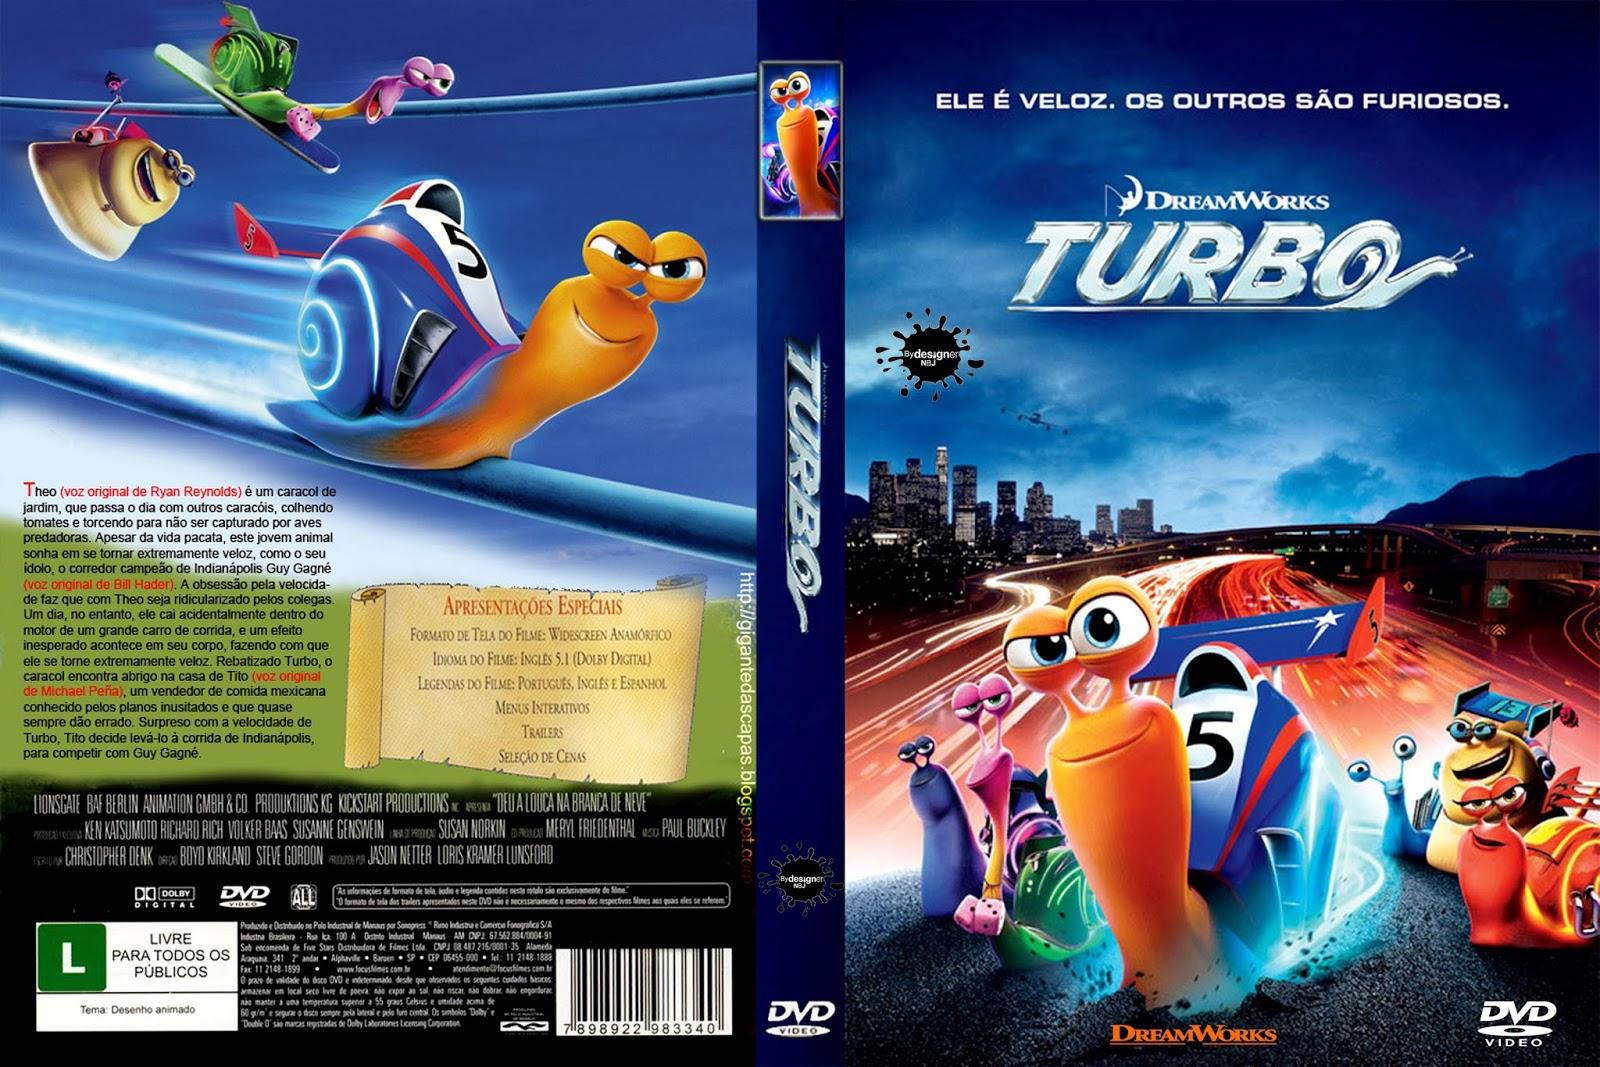 CAPAS DVD VIDEO JP: TURBO